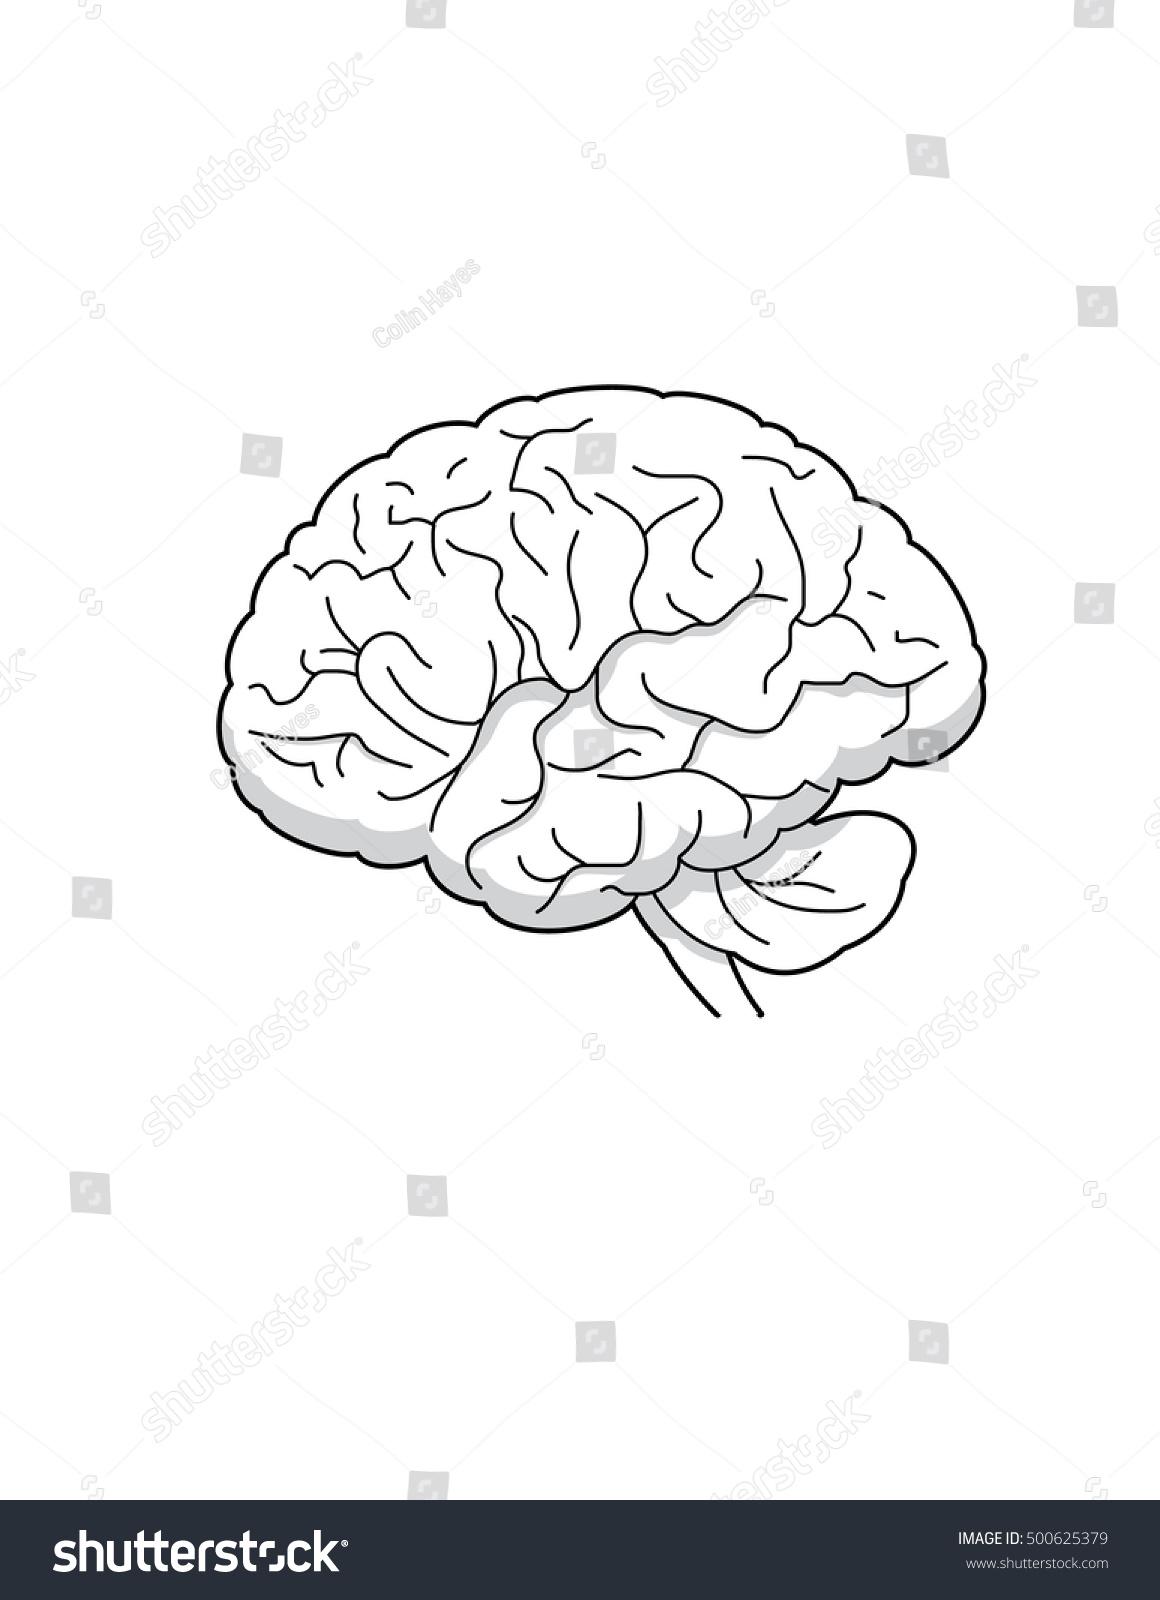 Line Drawing Human Brain Stock Vector Royalty Free 500625379